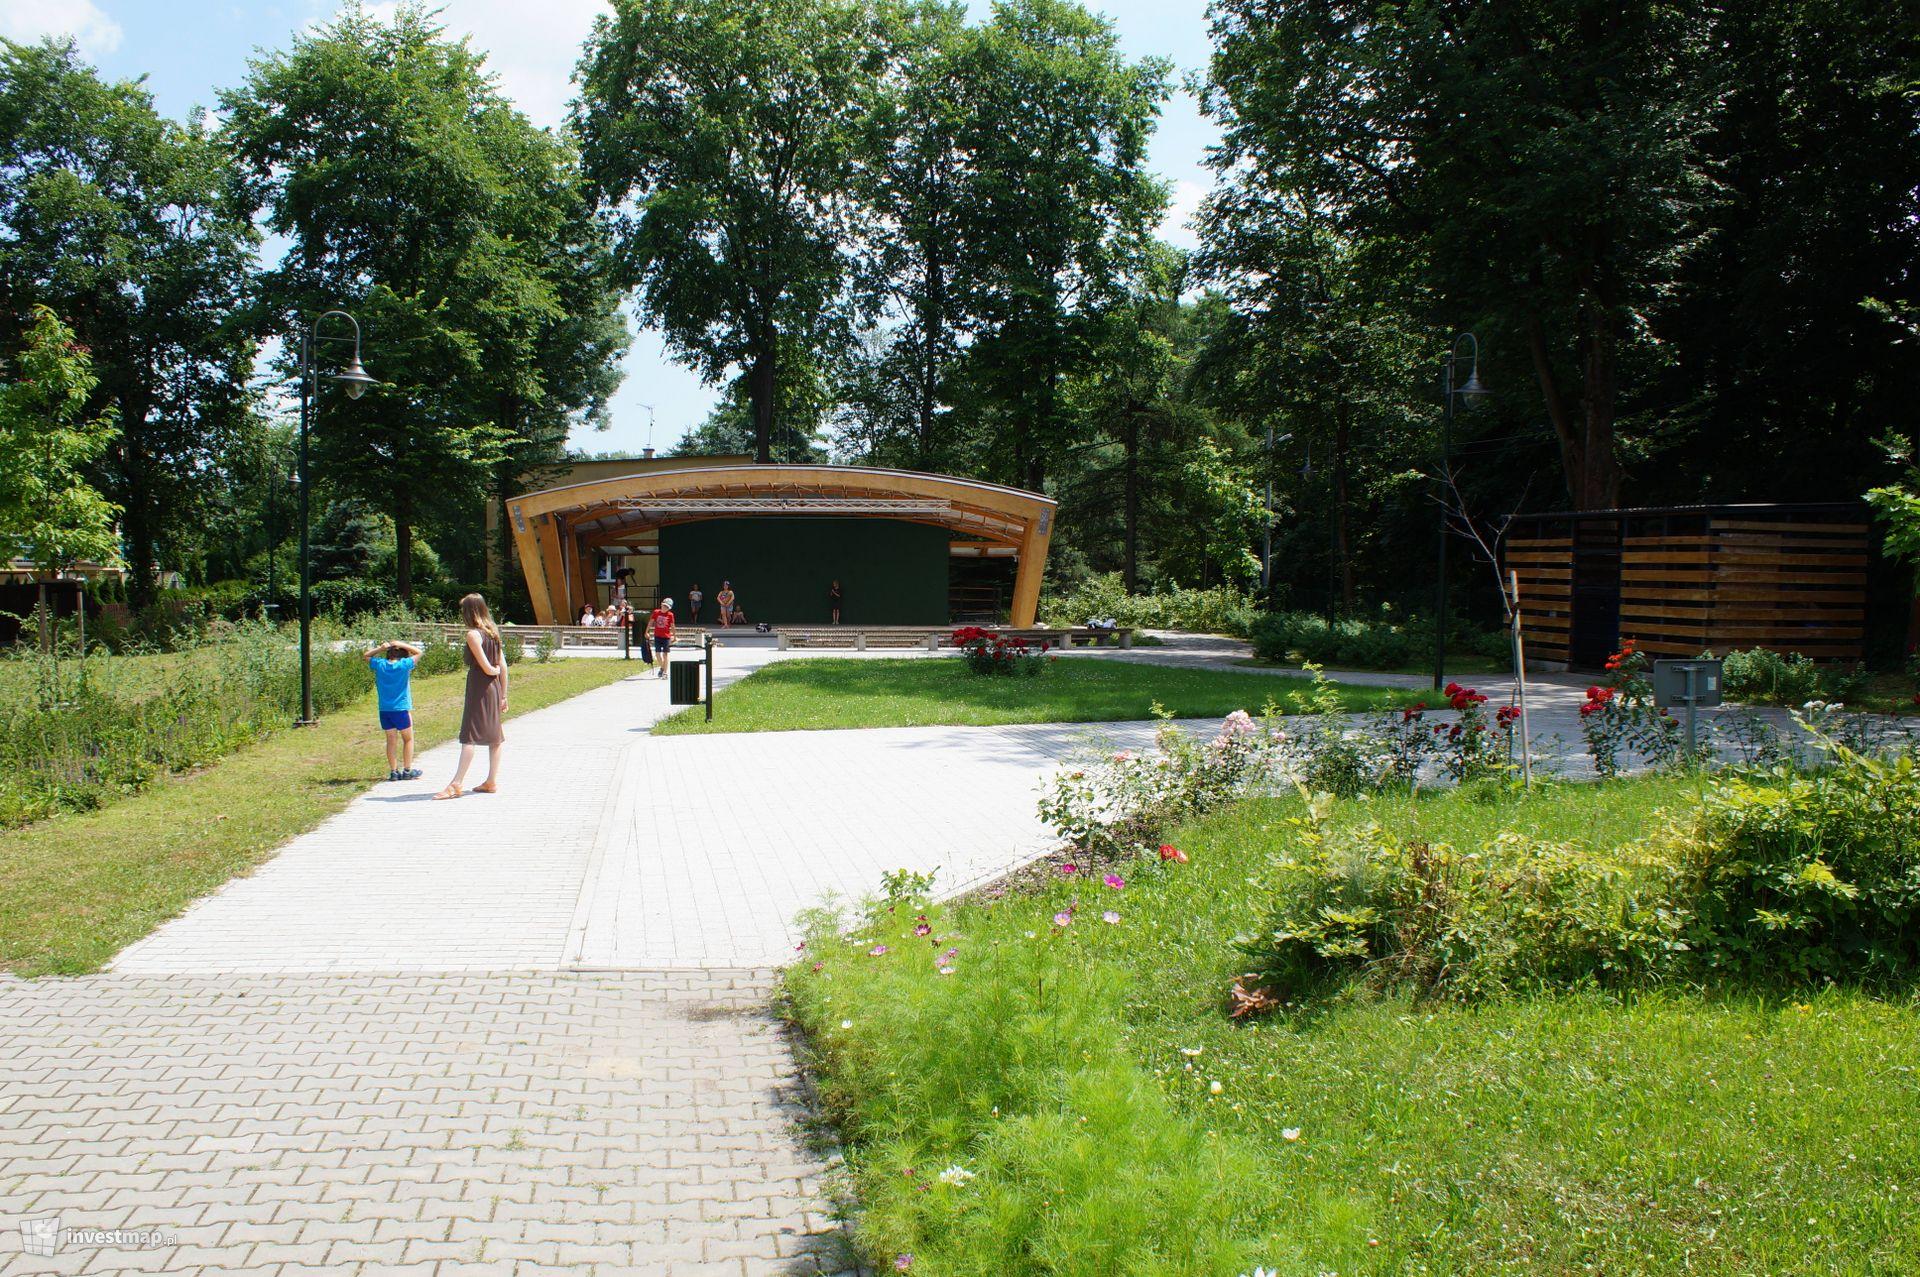 Amfiteatr, ul. Na Wrzosach 57